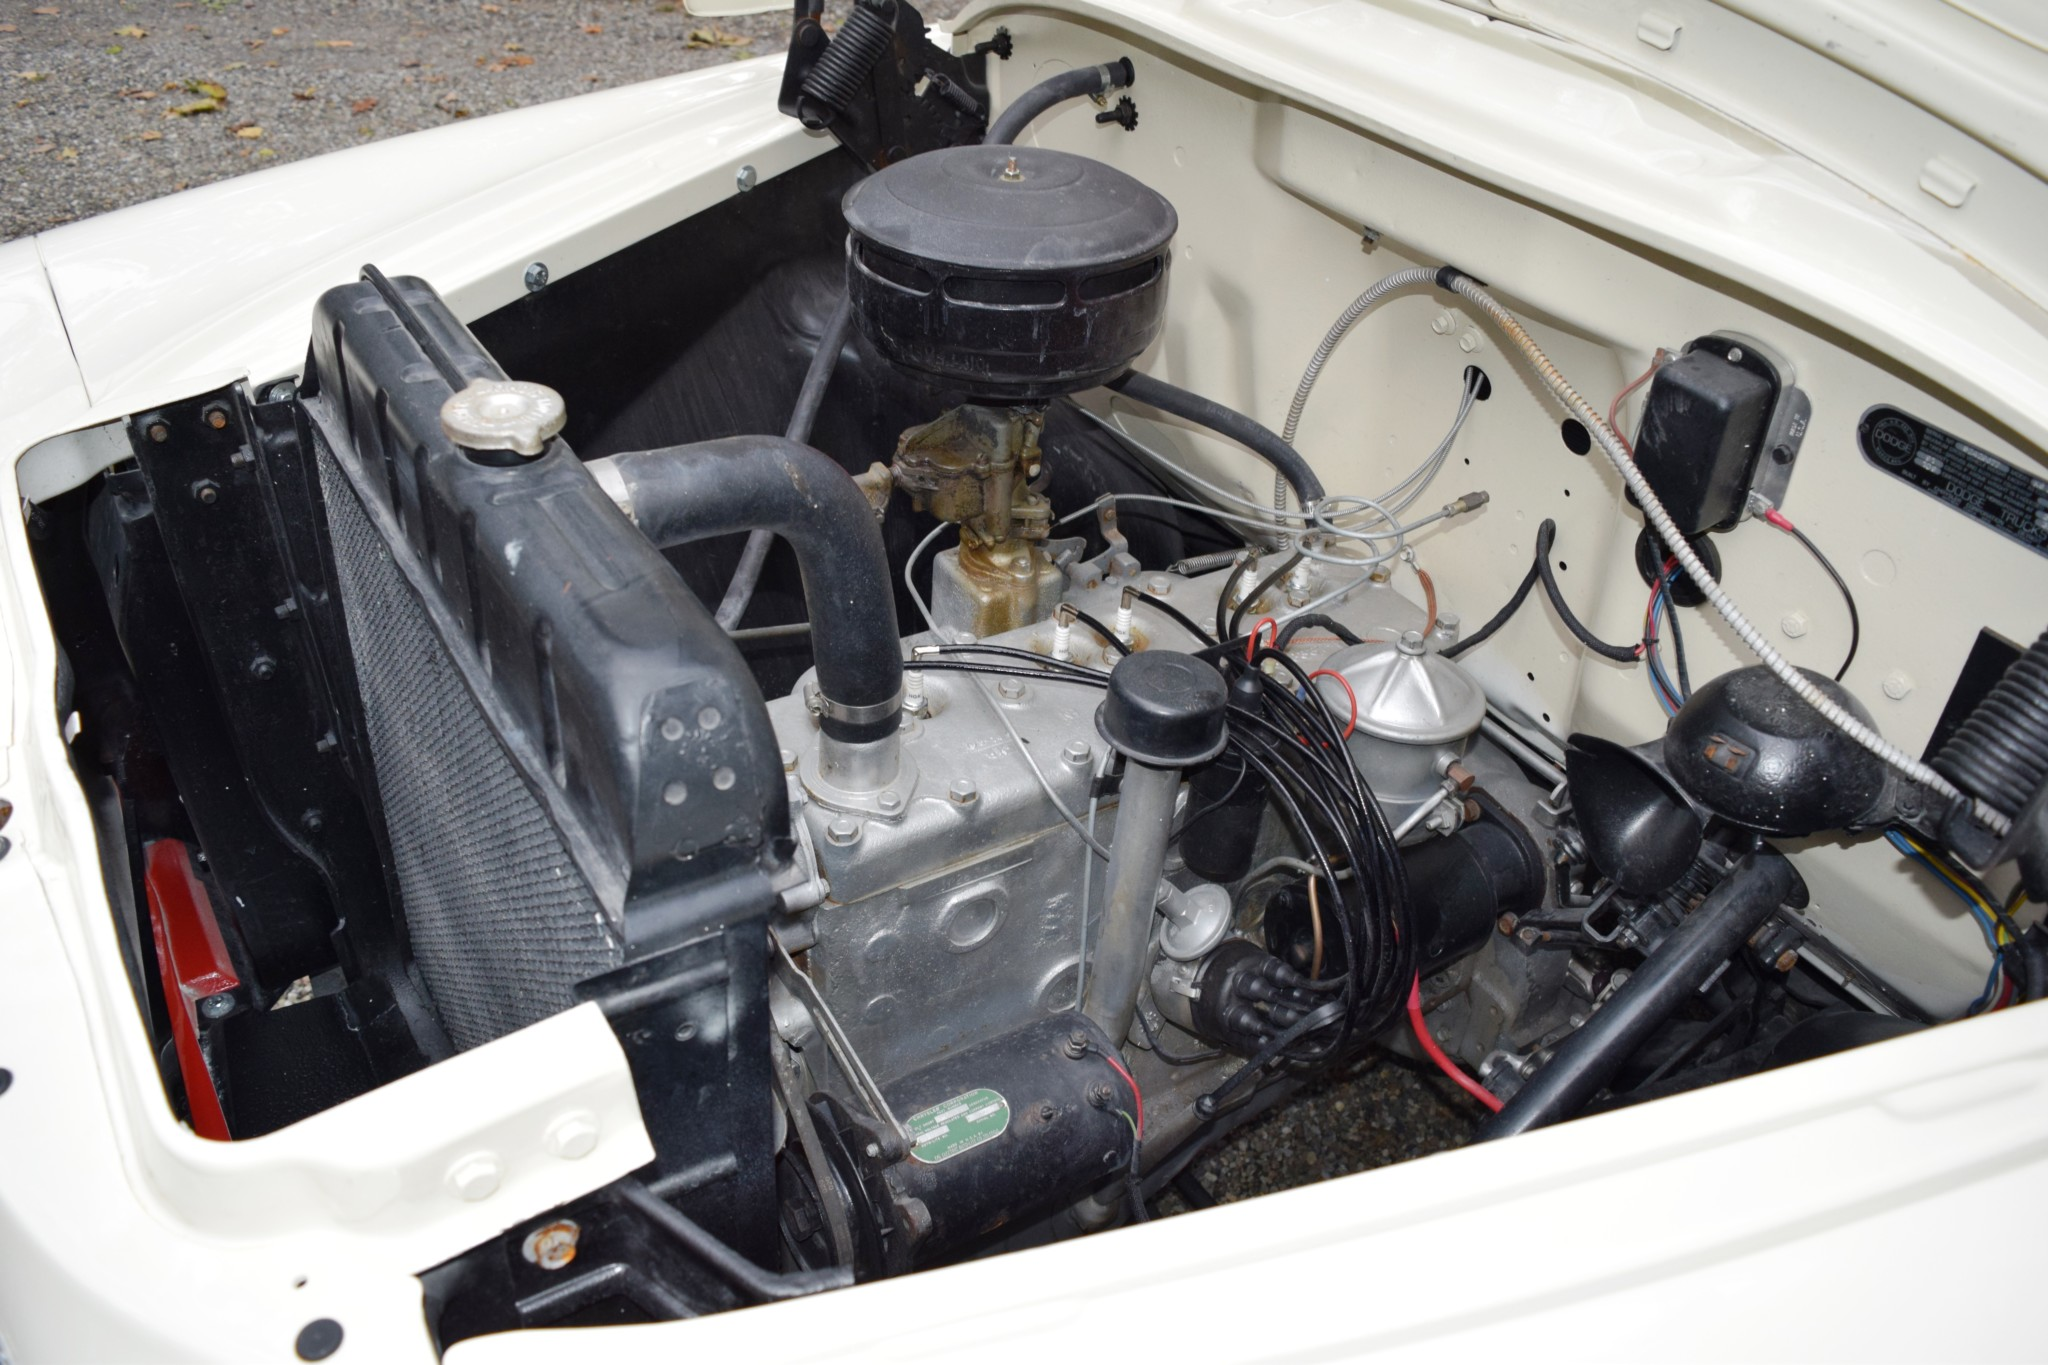 1957 Dodge D100 Sweptside inline 6 flathead engine